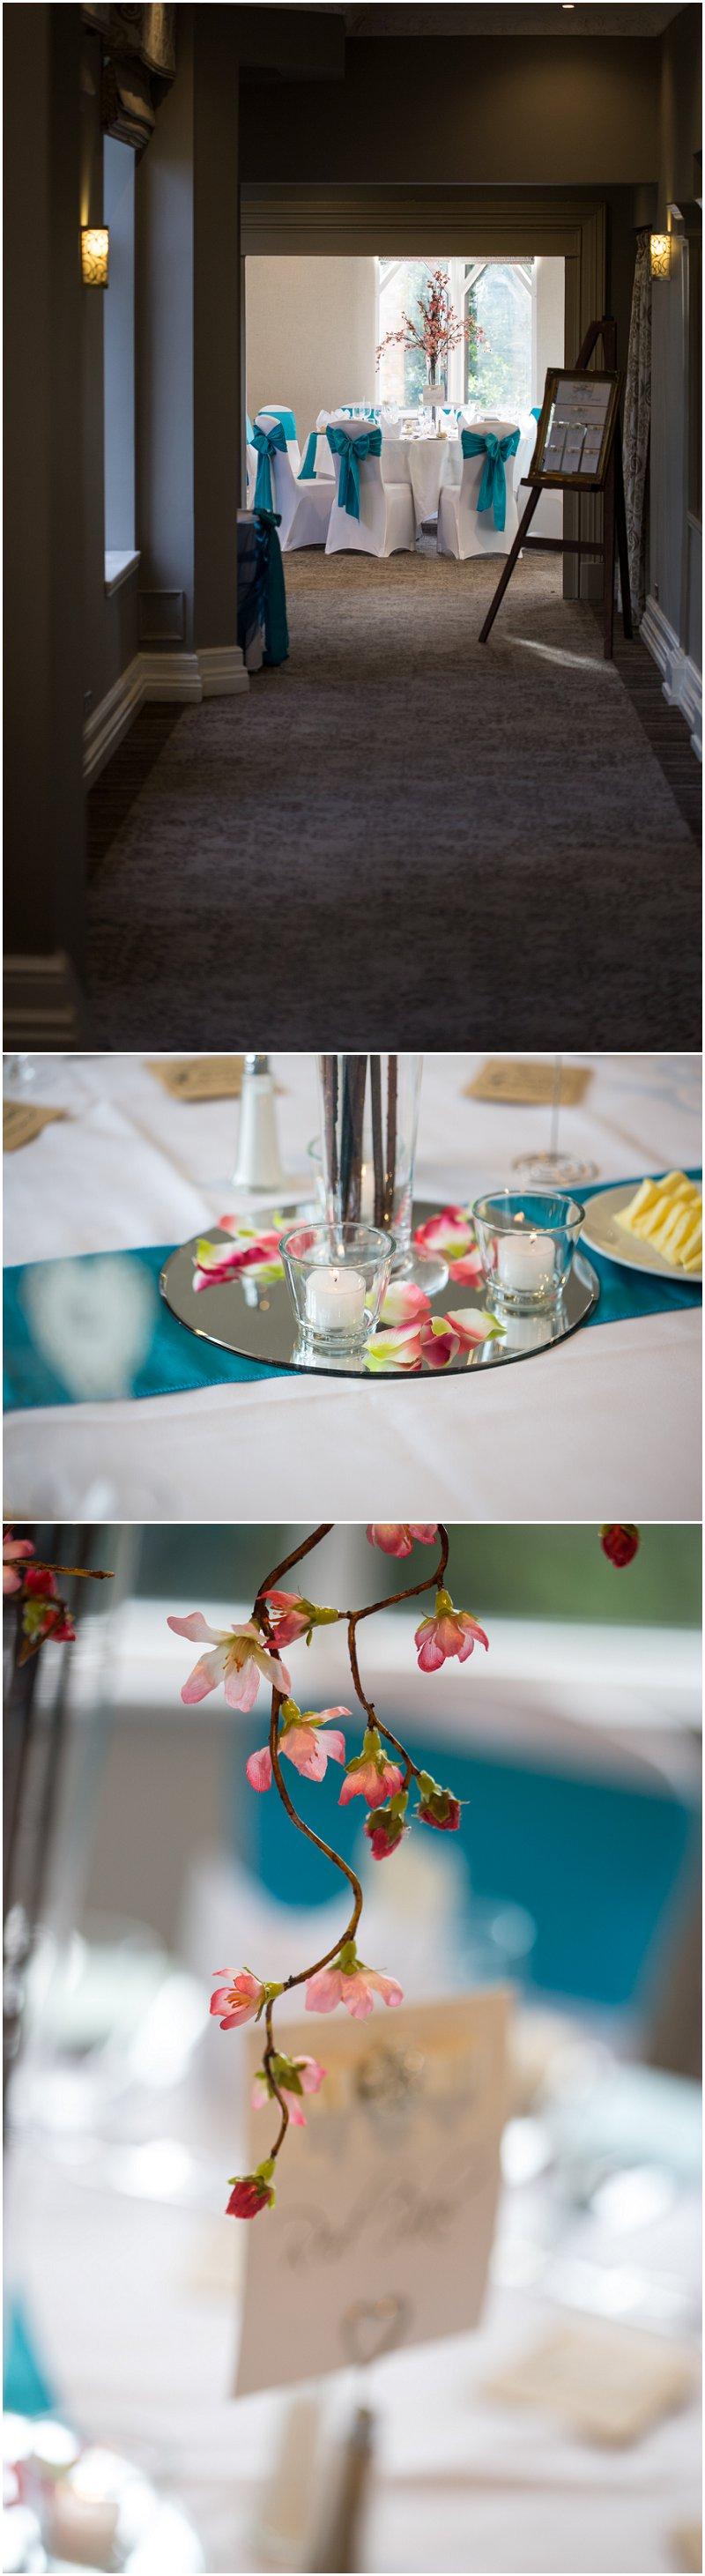 Wedding Breakfast at Crabwall Manor